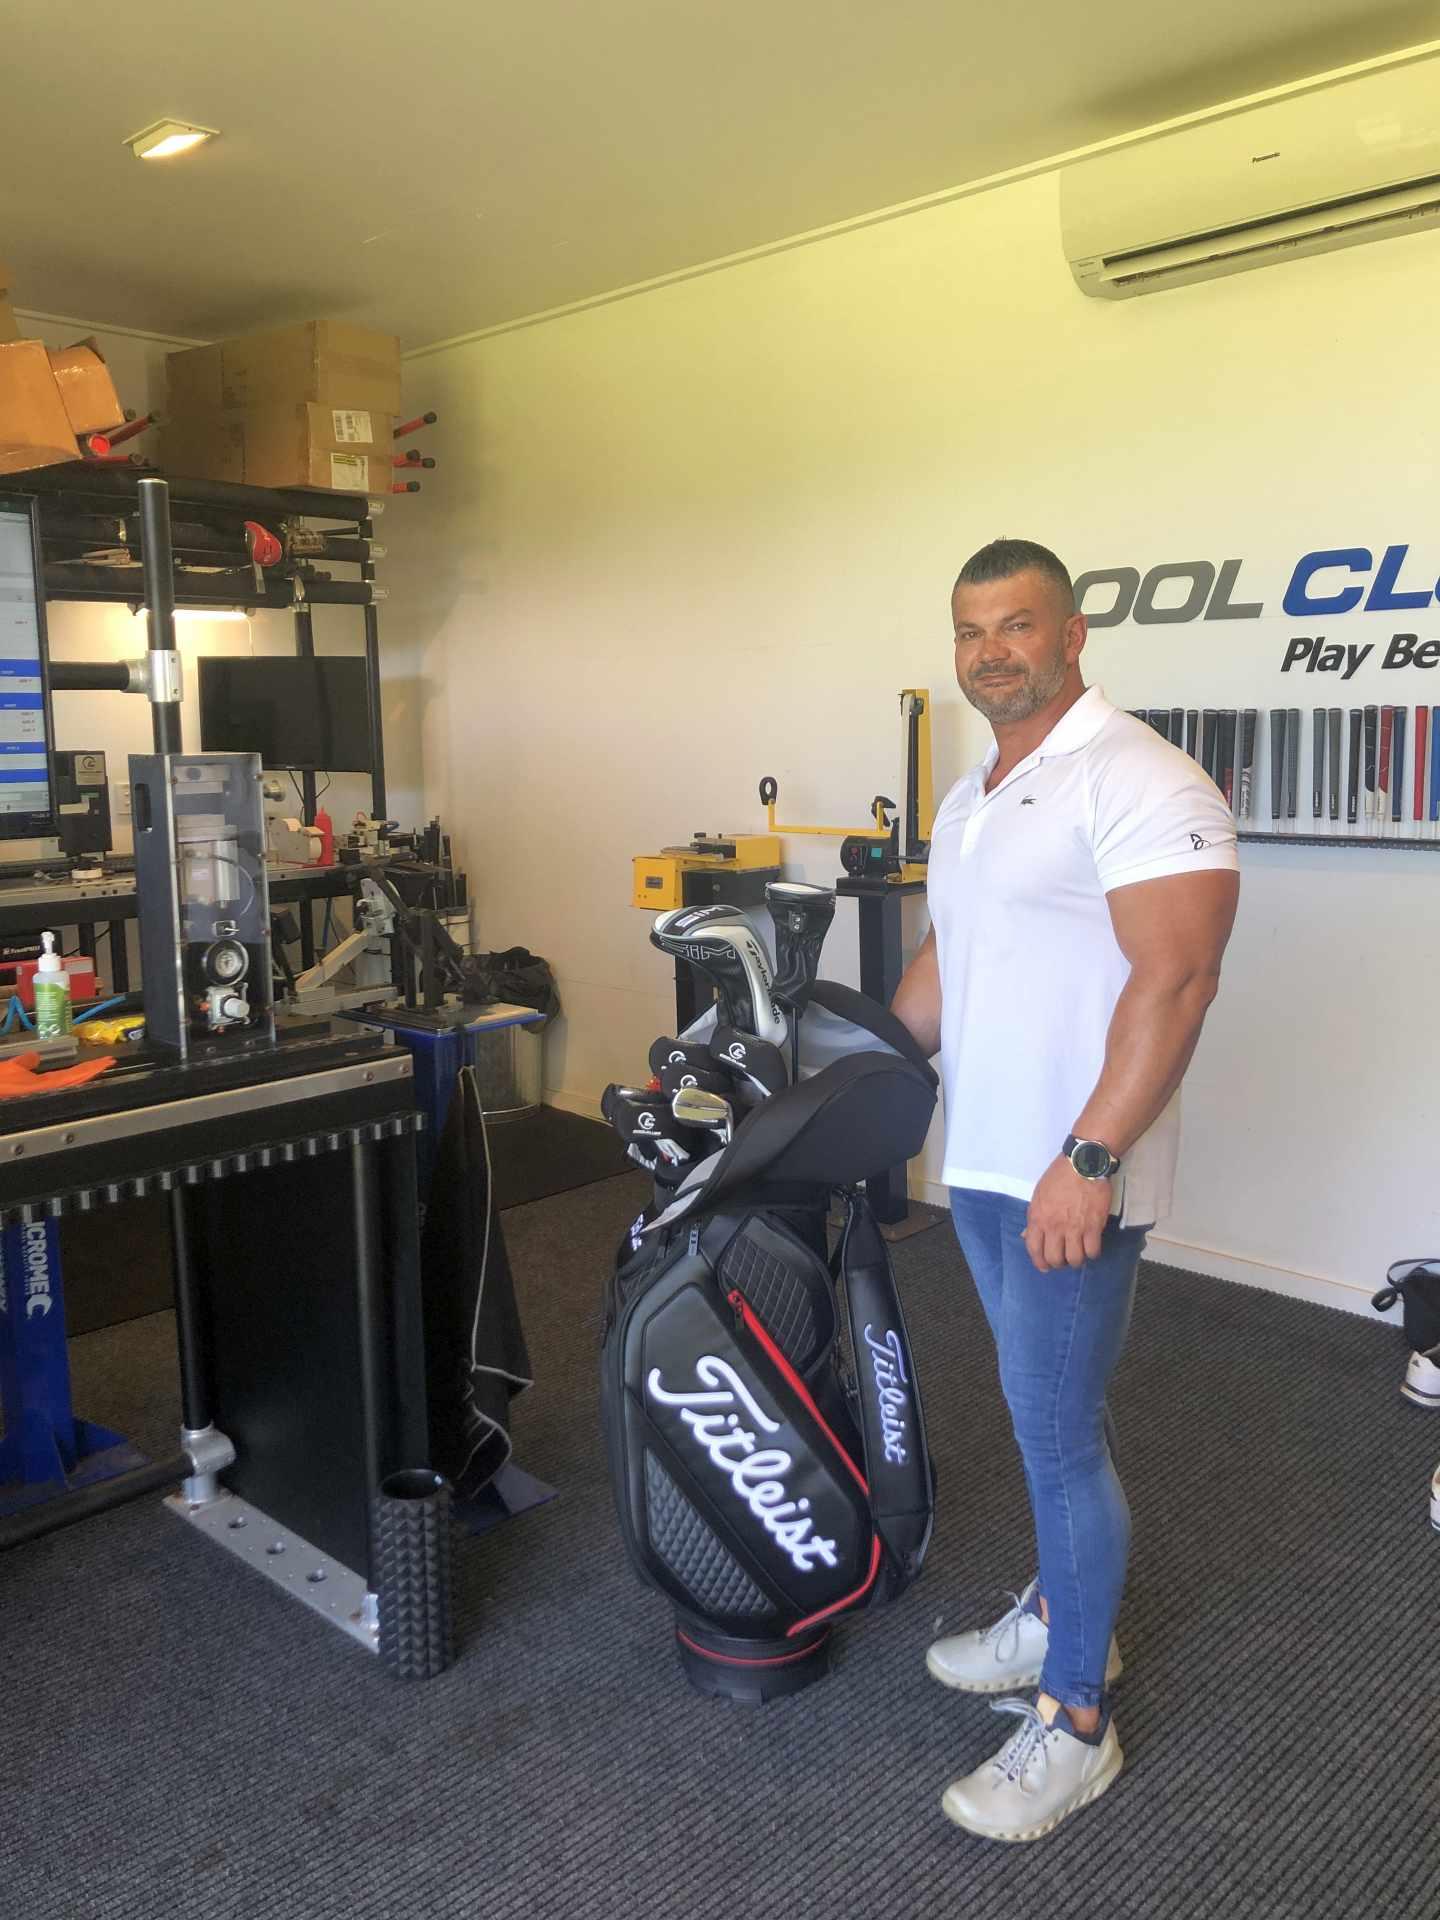 Club Pickup Cool Clubs Sydney